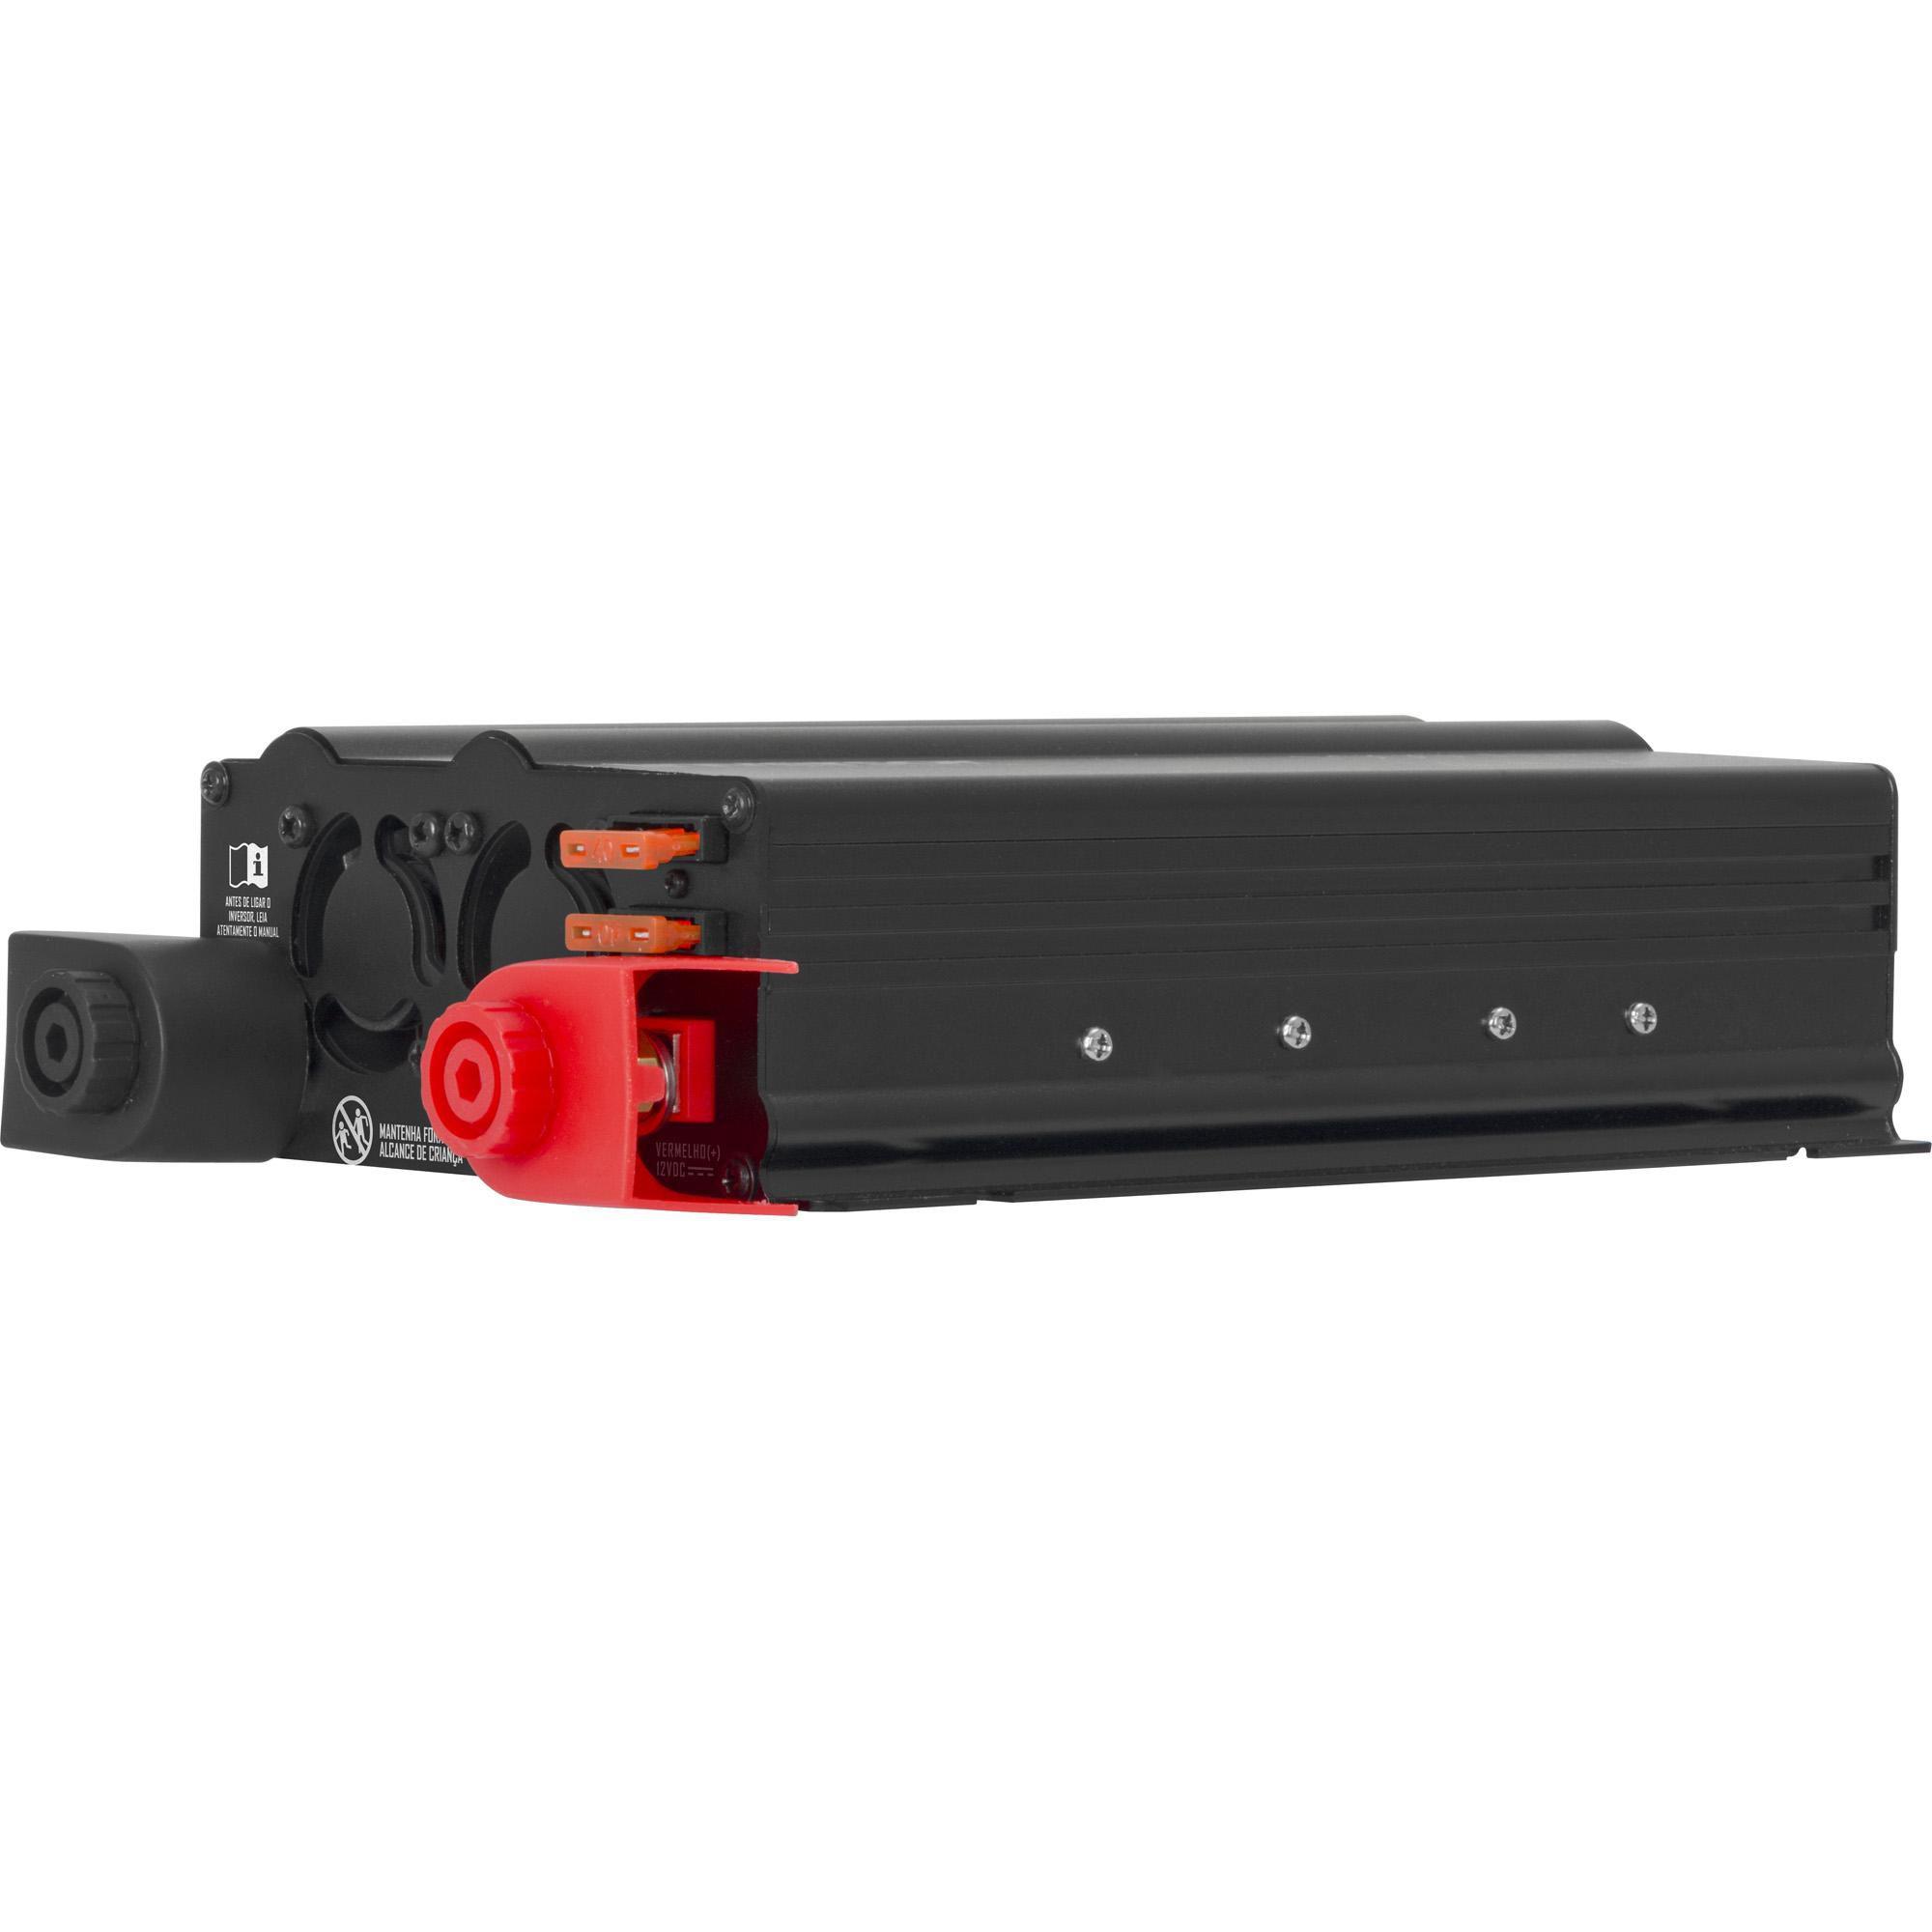 INVERSOR HAYONIC 1000W 12VDC/127V USB ONDA MODIFICADA GD